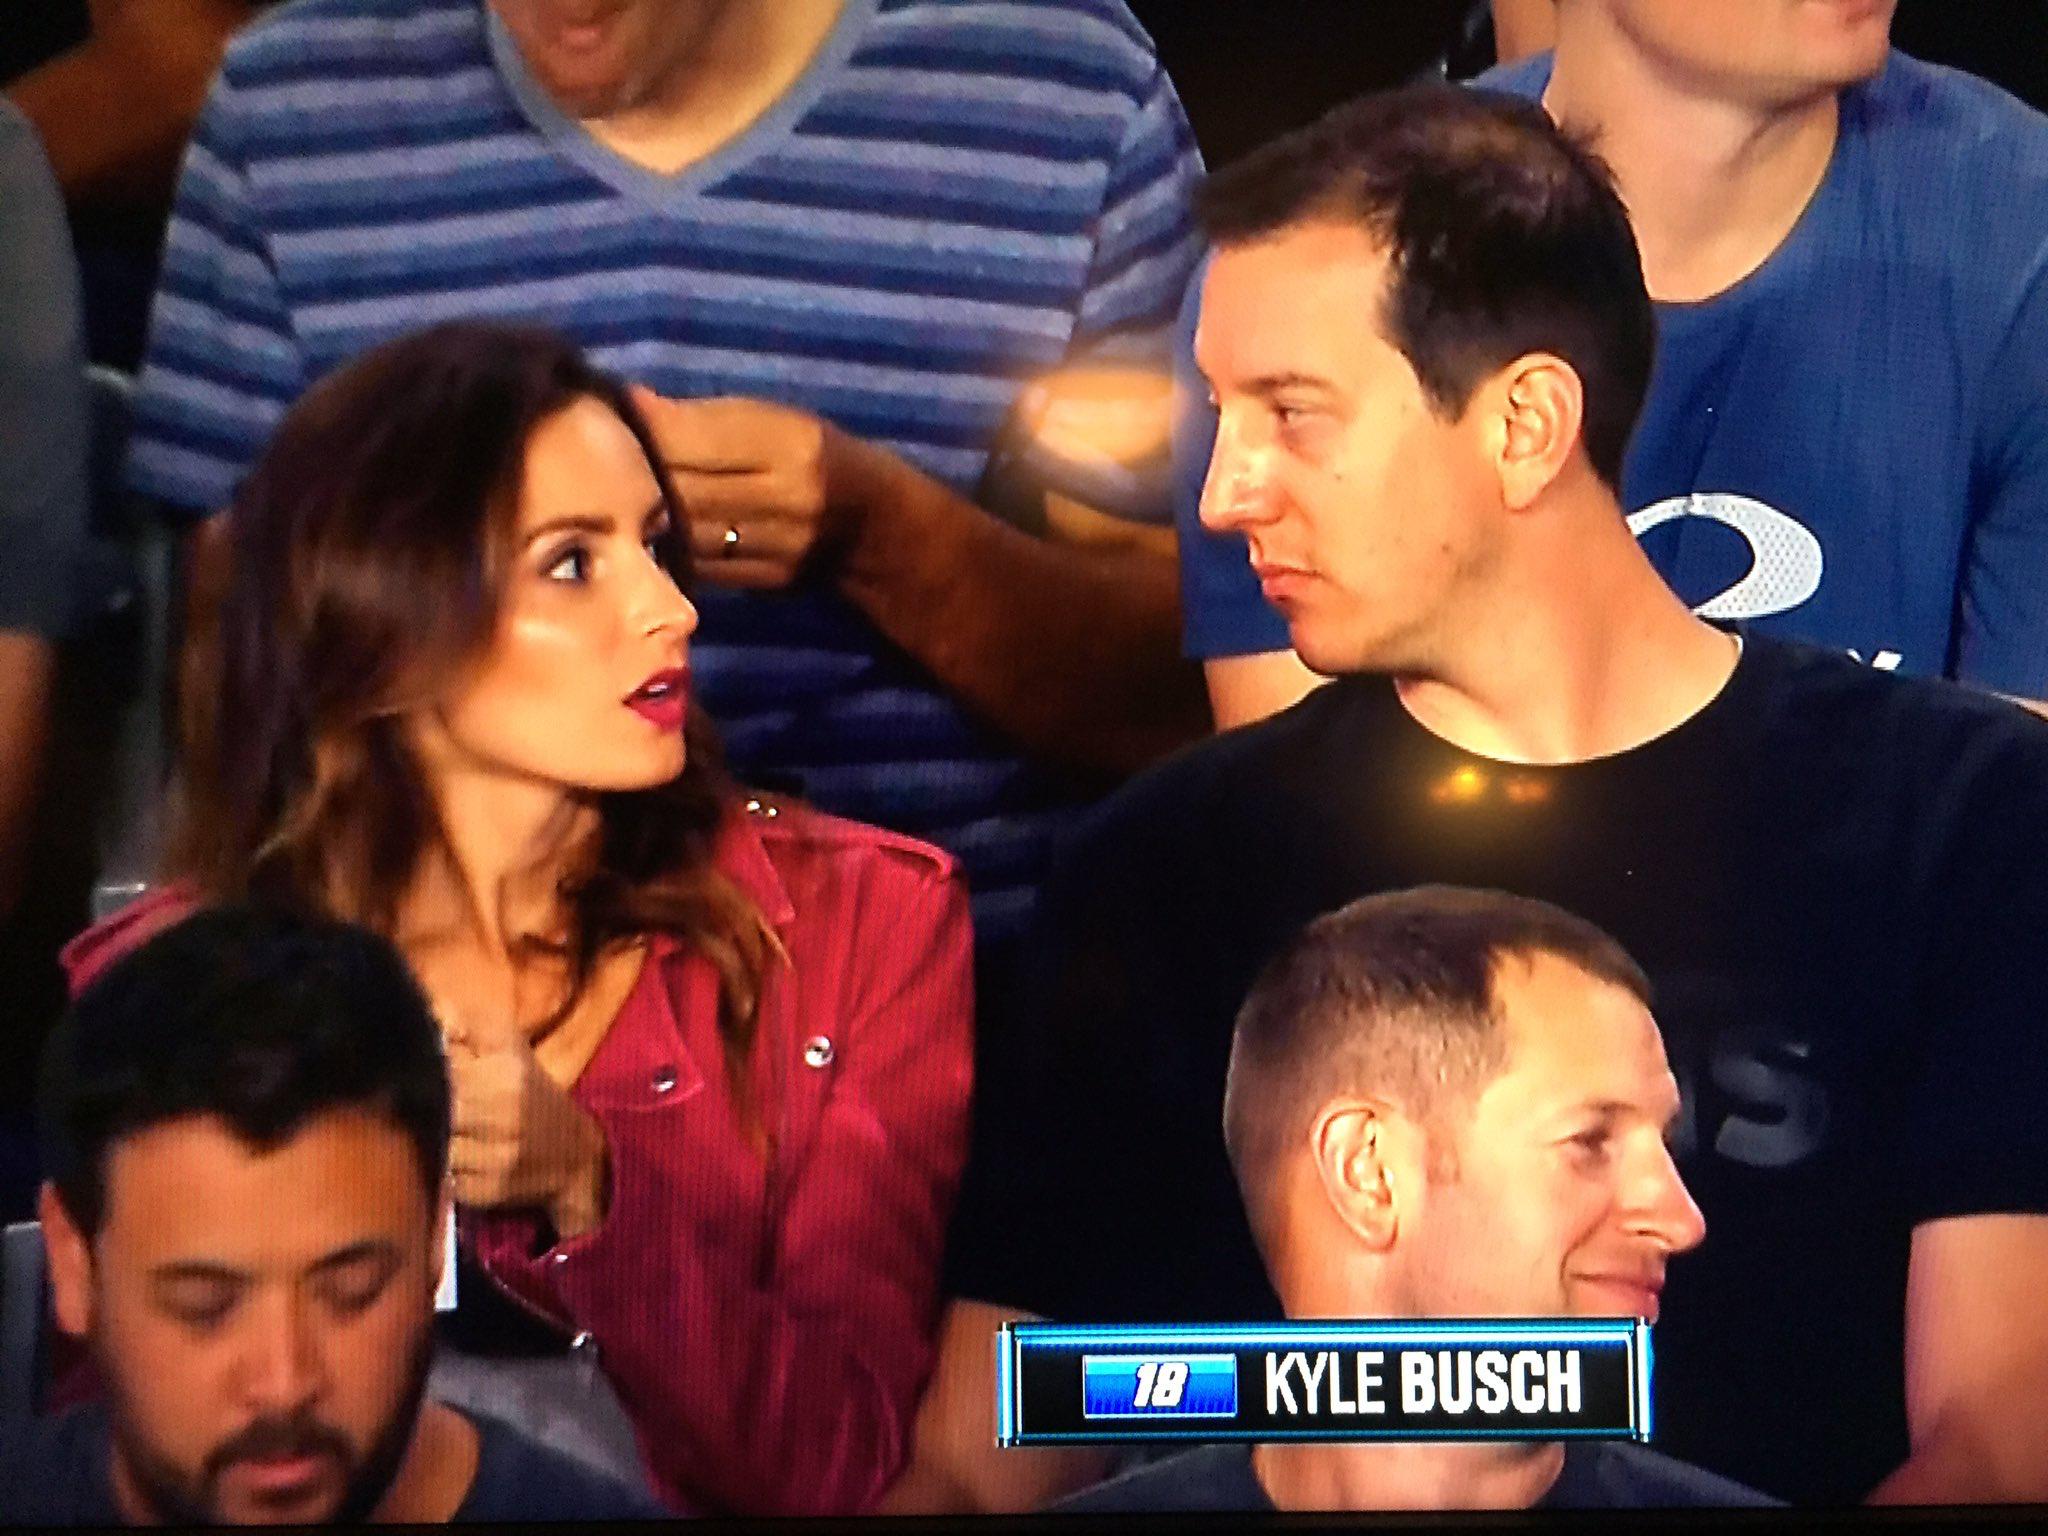 🙈 serious convo over a hot pretzel or churro debate RT @JMorrisTV: Smile. You're on candid camera. Thursday night football love for @SamanthaBusch @KyleBusch #NASCAR